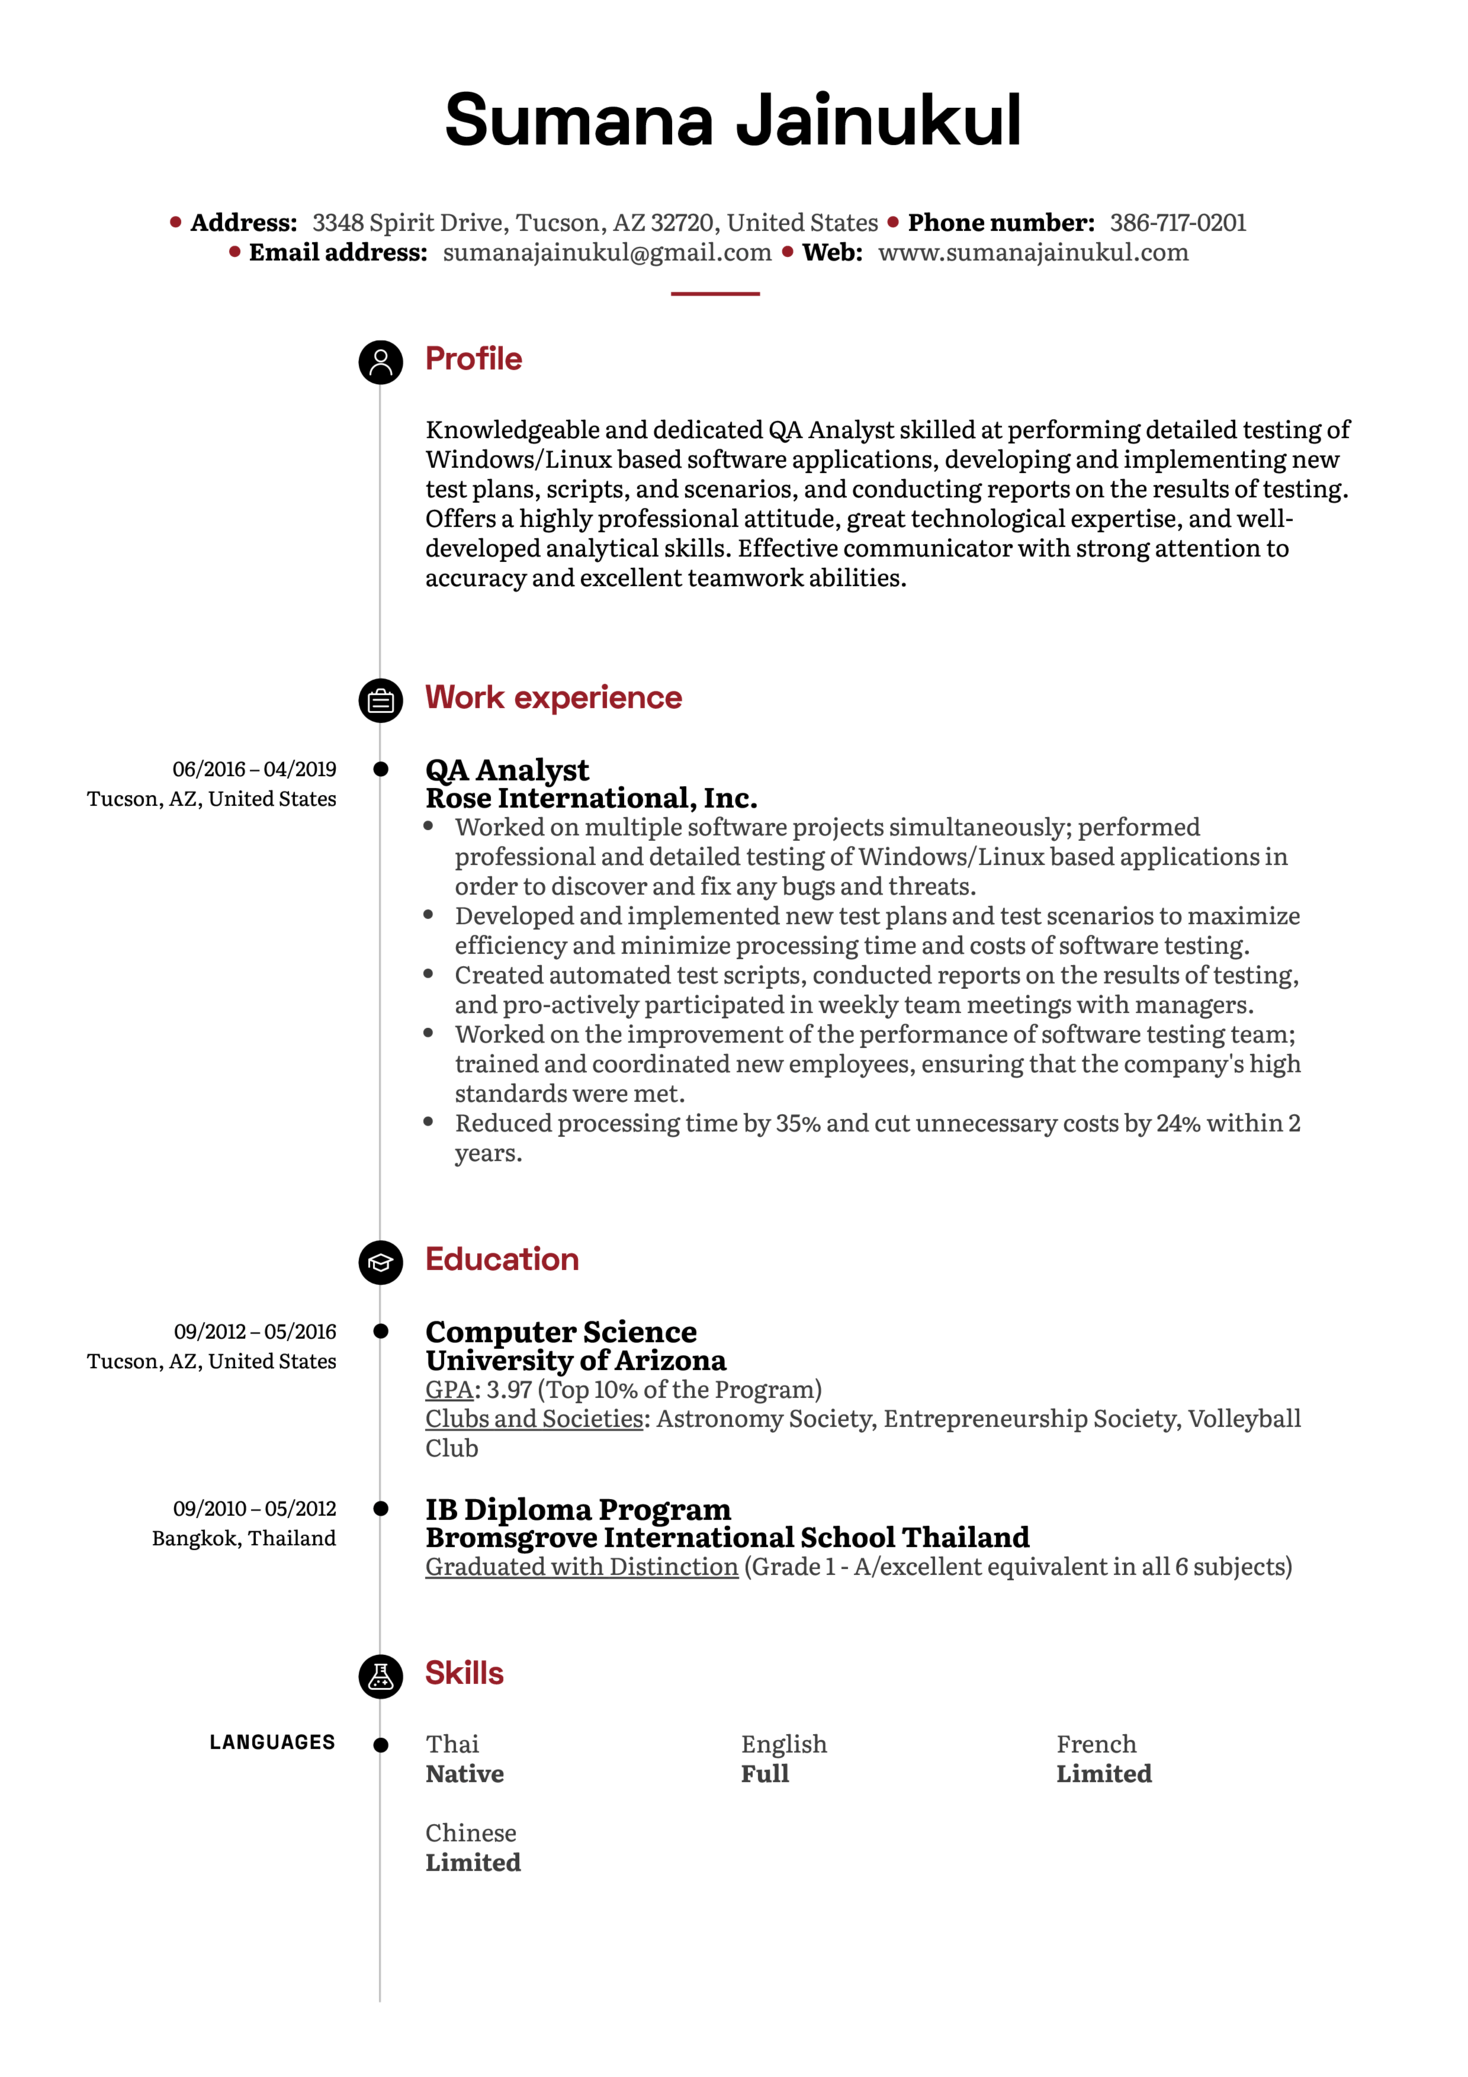 QA Analyst Resume Example (Part 1)